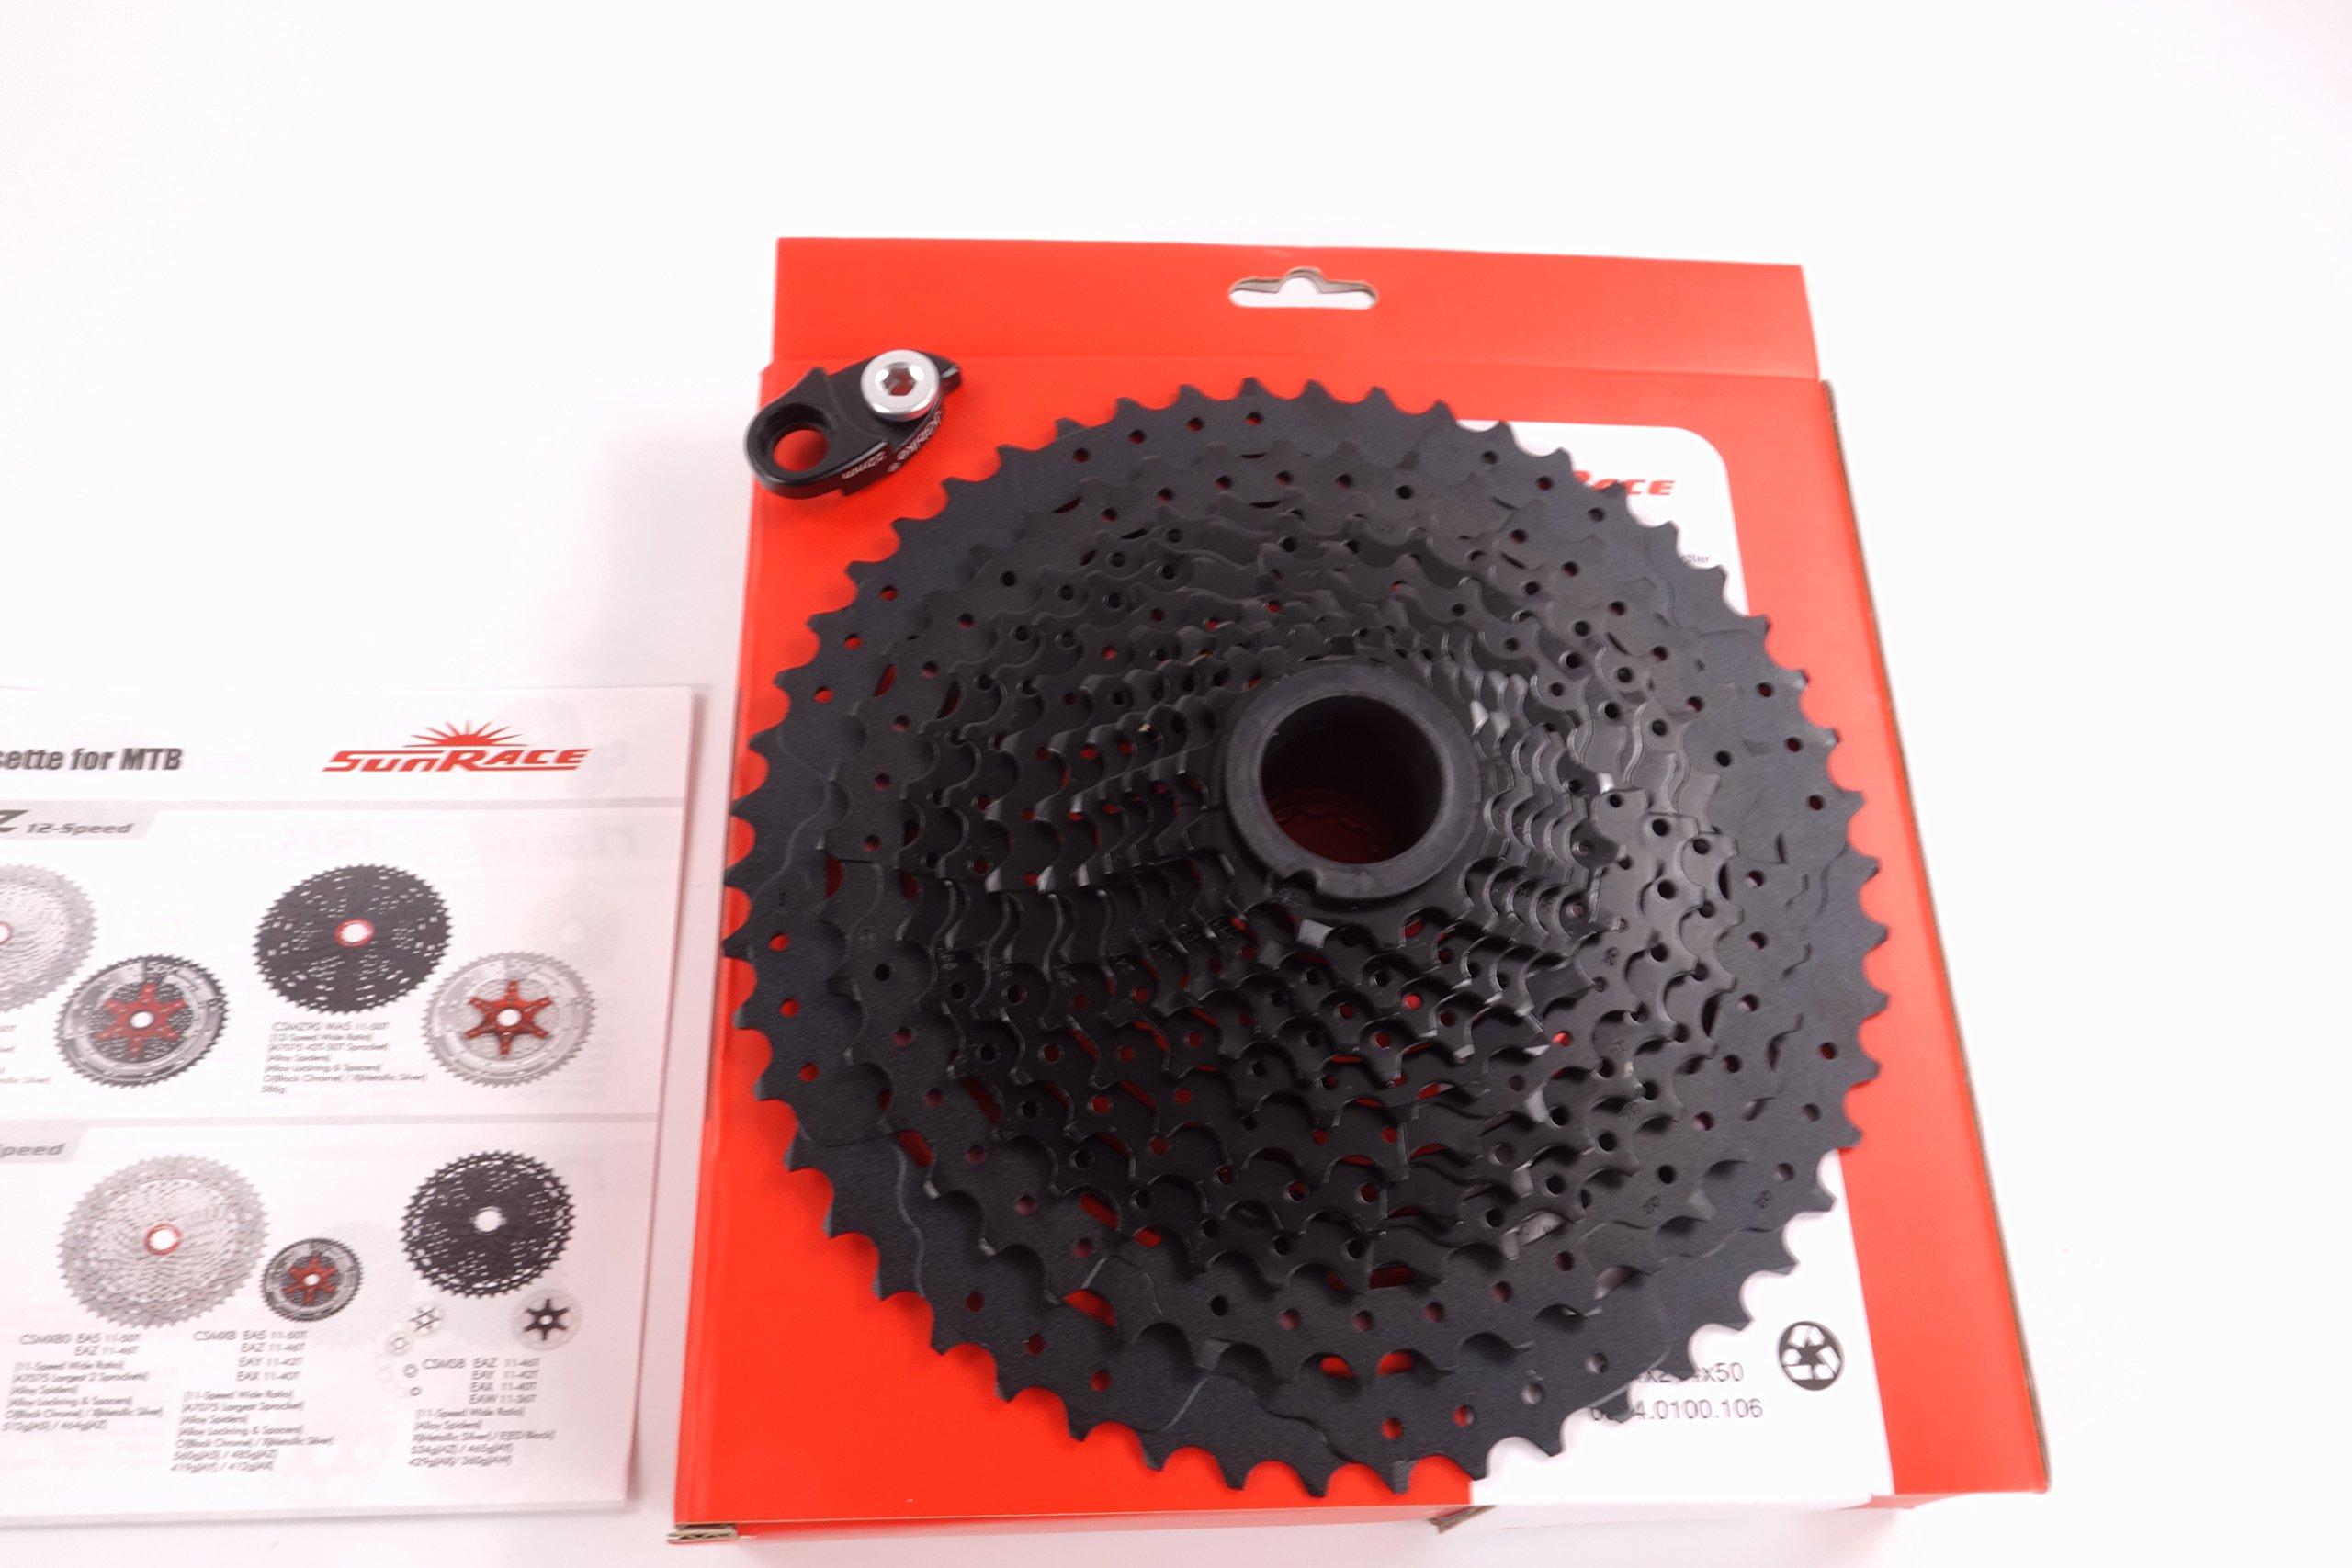 Sunrace 12-speed 11-50T cassette freewheel CSMZ90 WA5 wide ratio MTB in Black with RD extender by JGbike (Image #5)